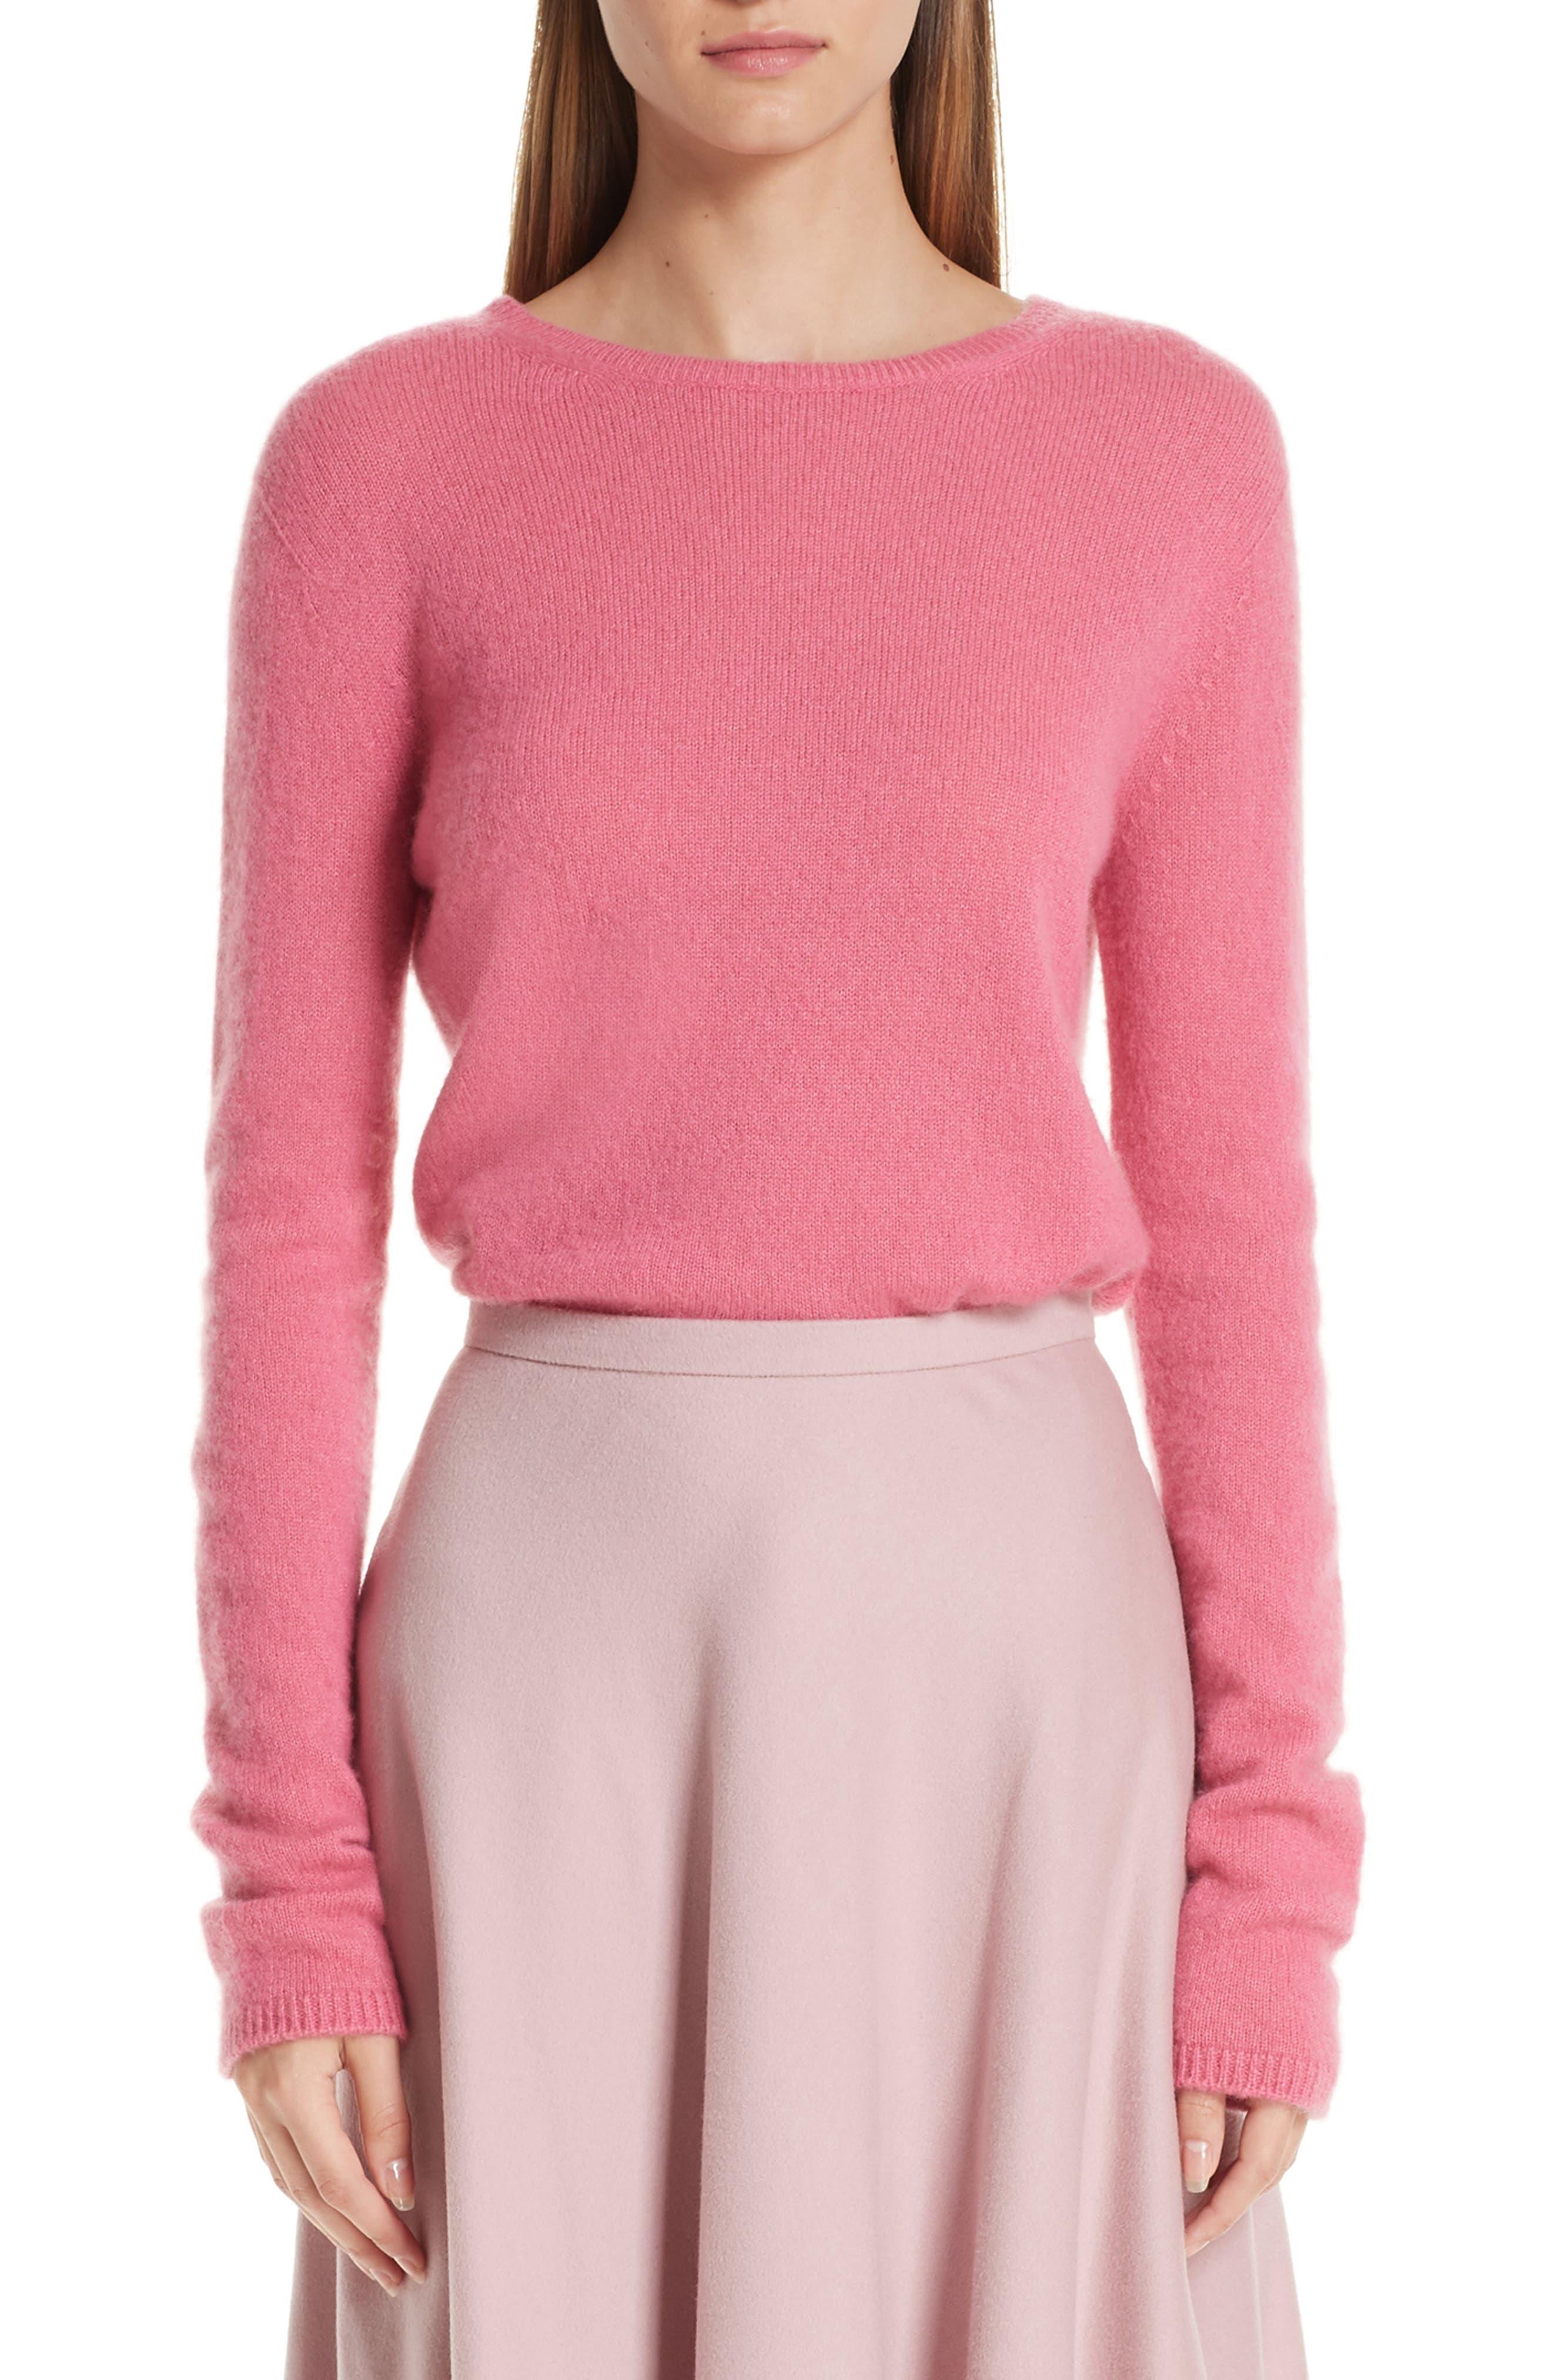 MAX MARA, Stelvio Cashmere & Silk Sweater, Main thumbnail 1, color, 672